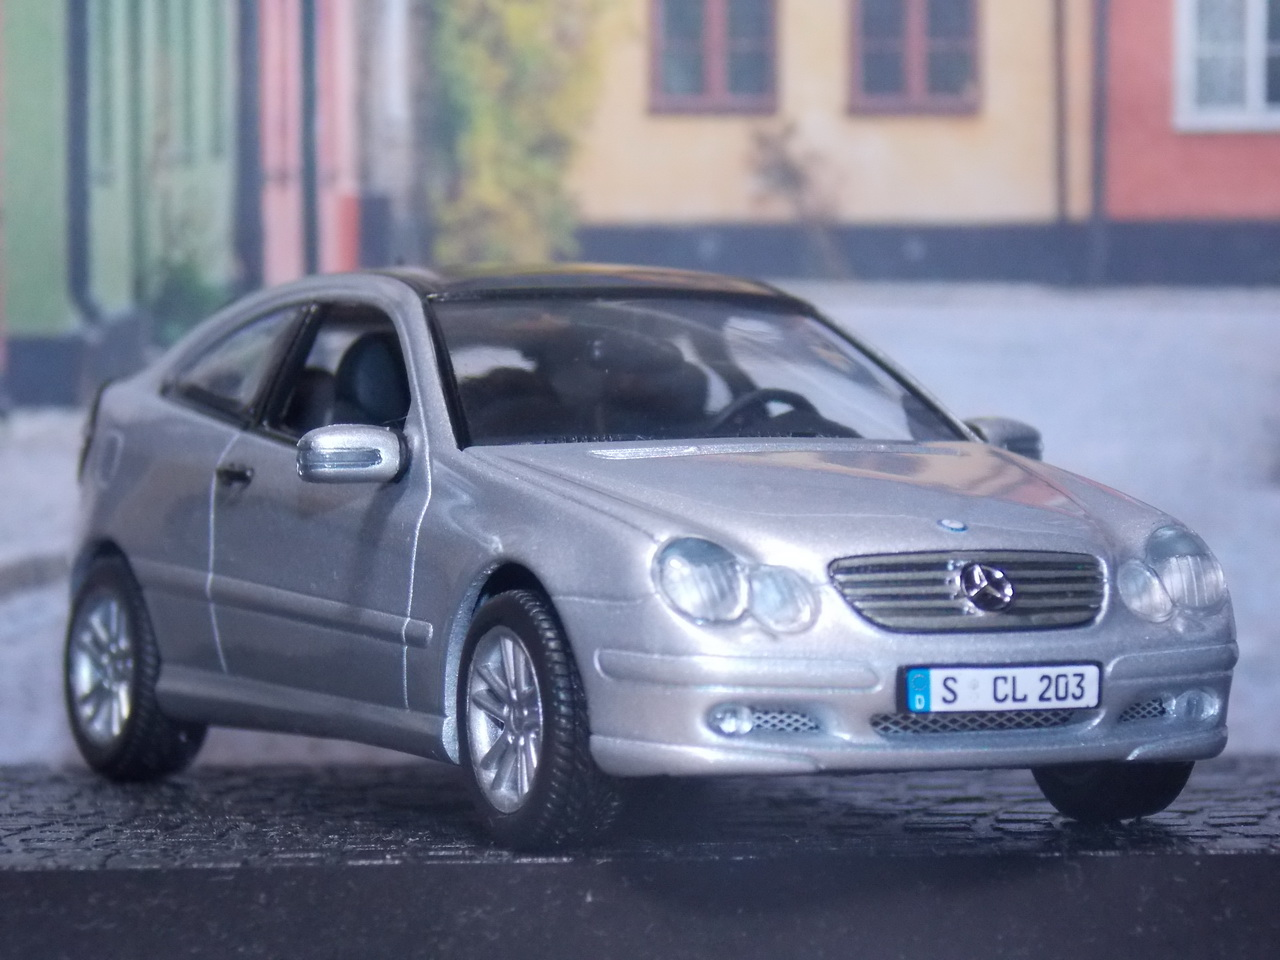 Mercedes Benz C-Class Sport Coupe – 2000